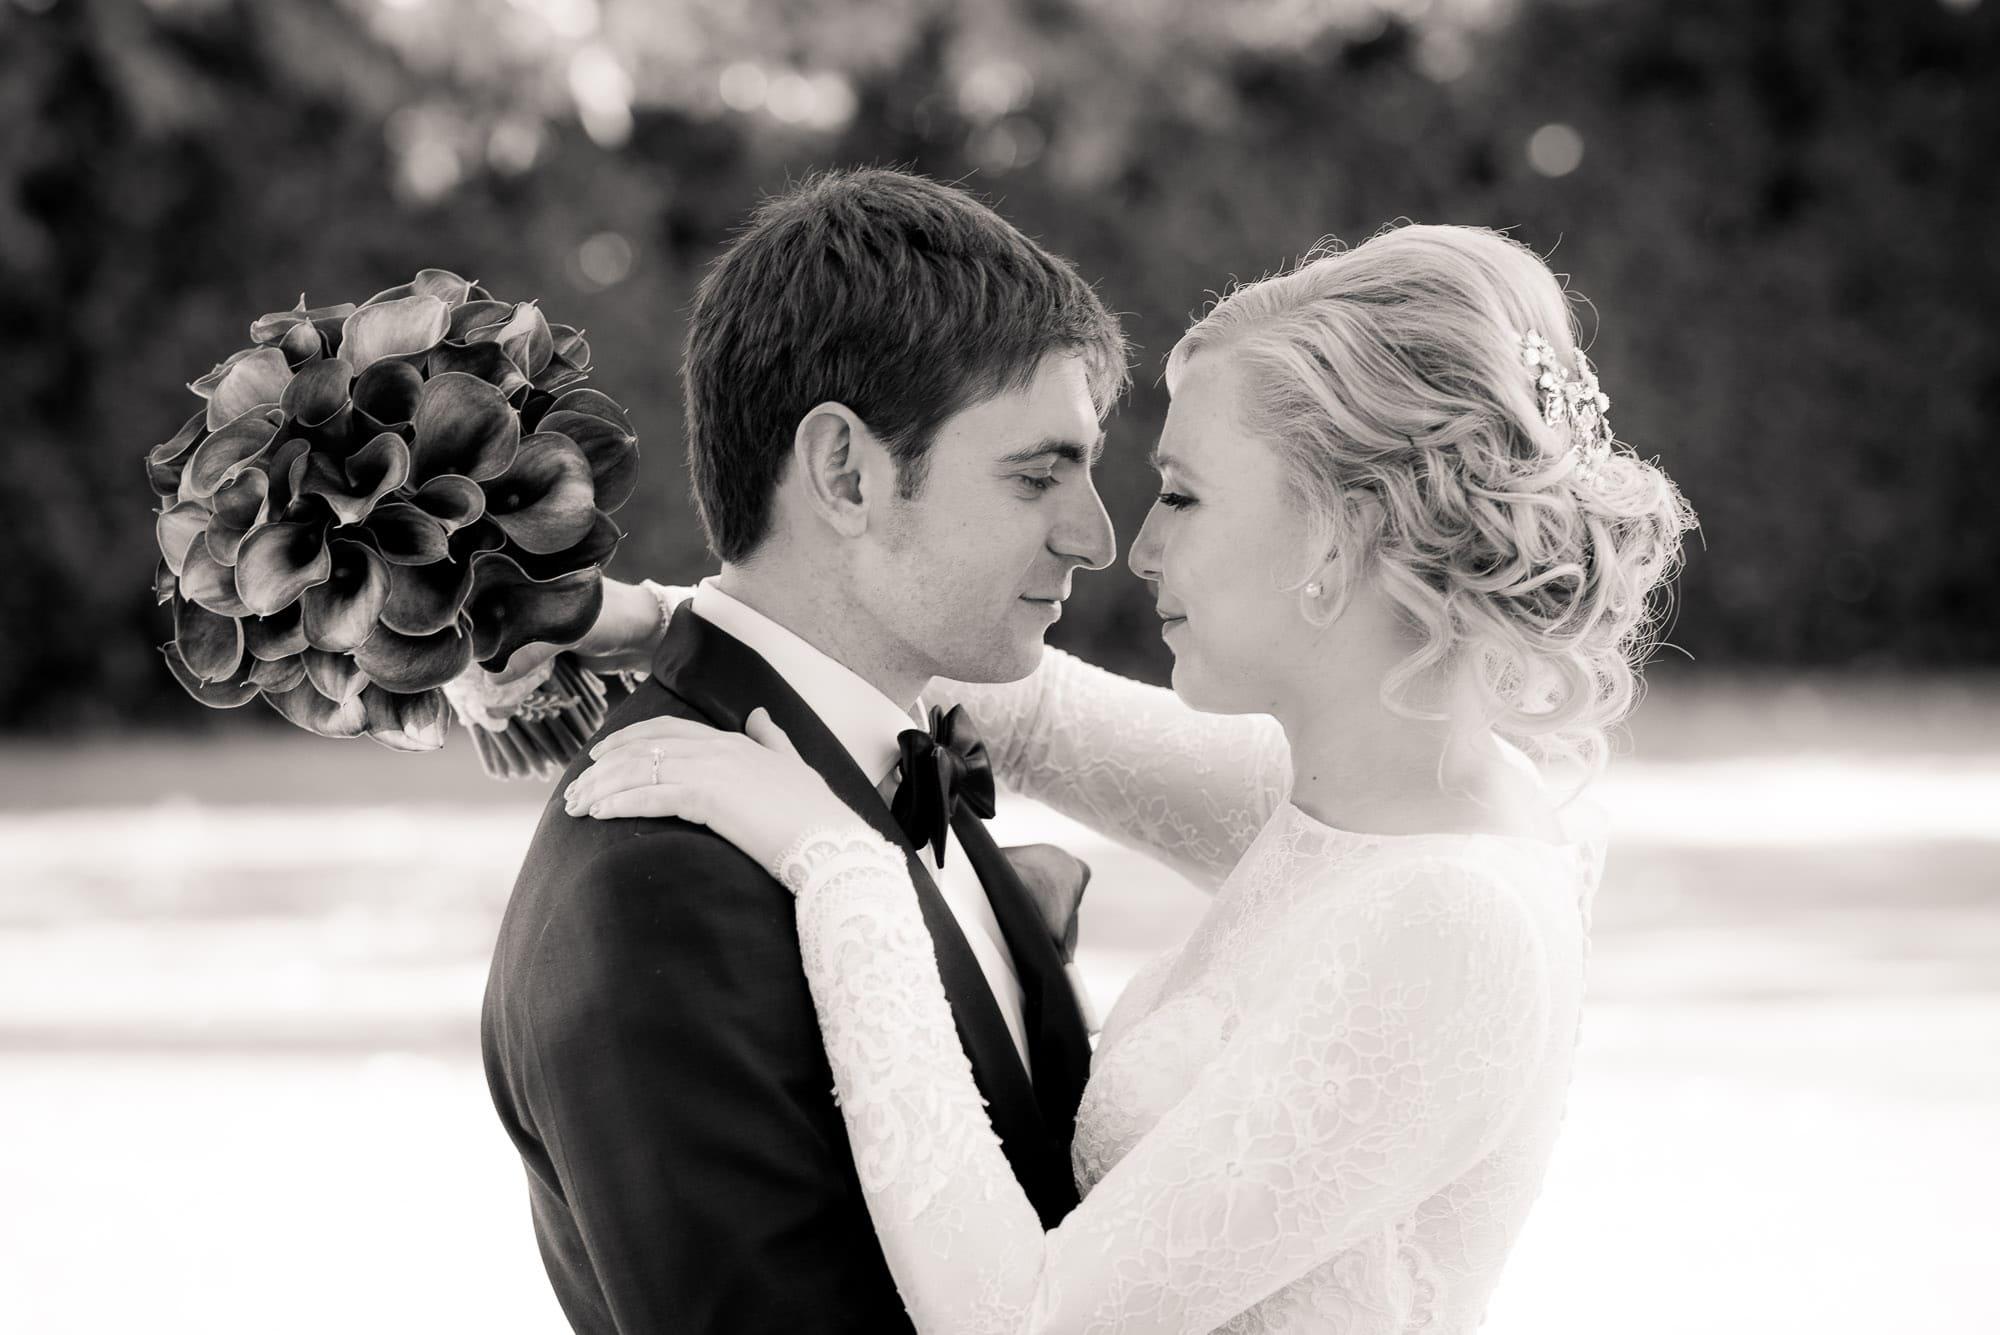 025_Alan_and_Heidi_Los_Angeles_Equestrian_Center_Wedding